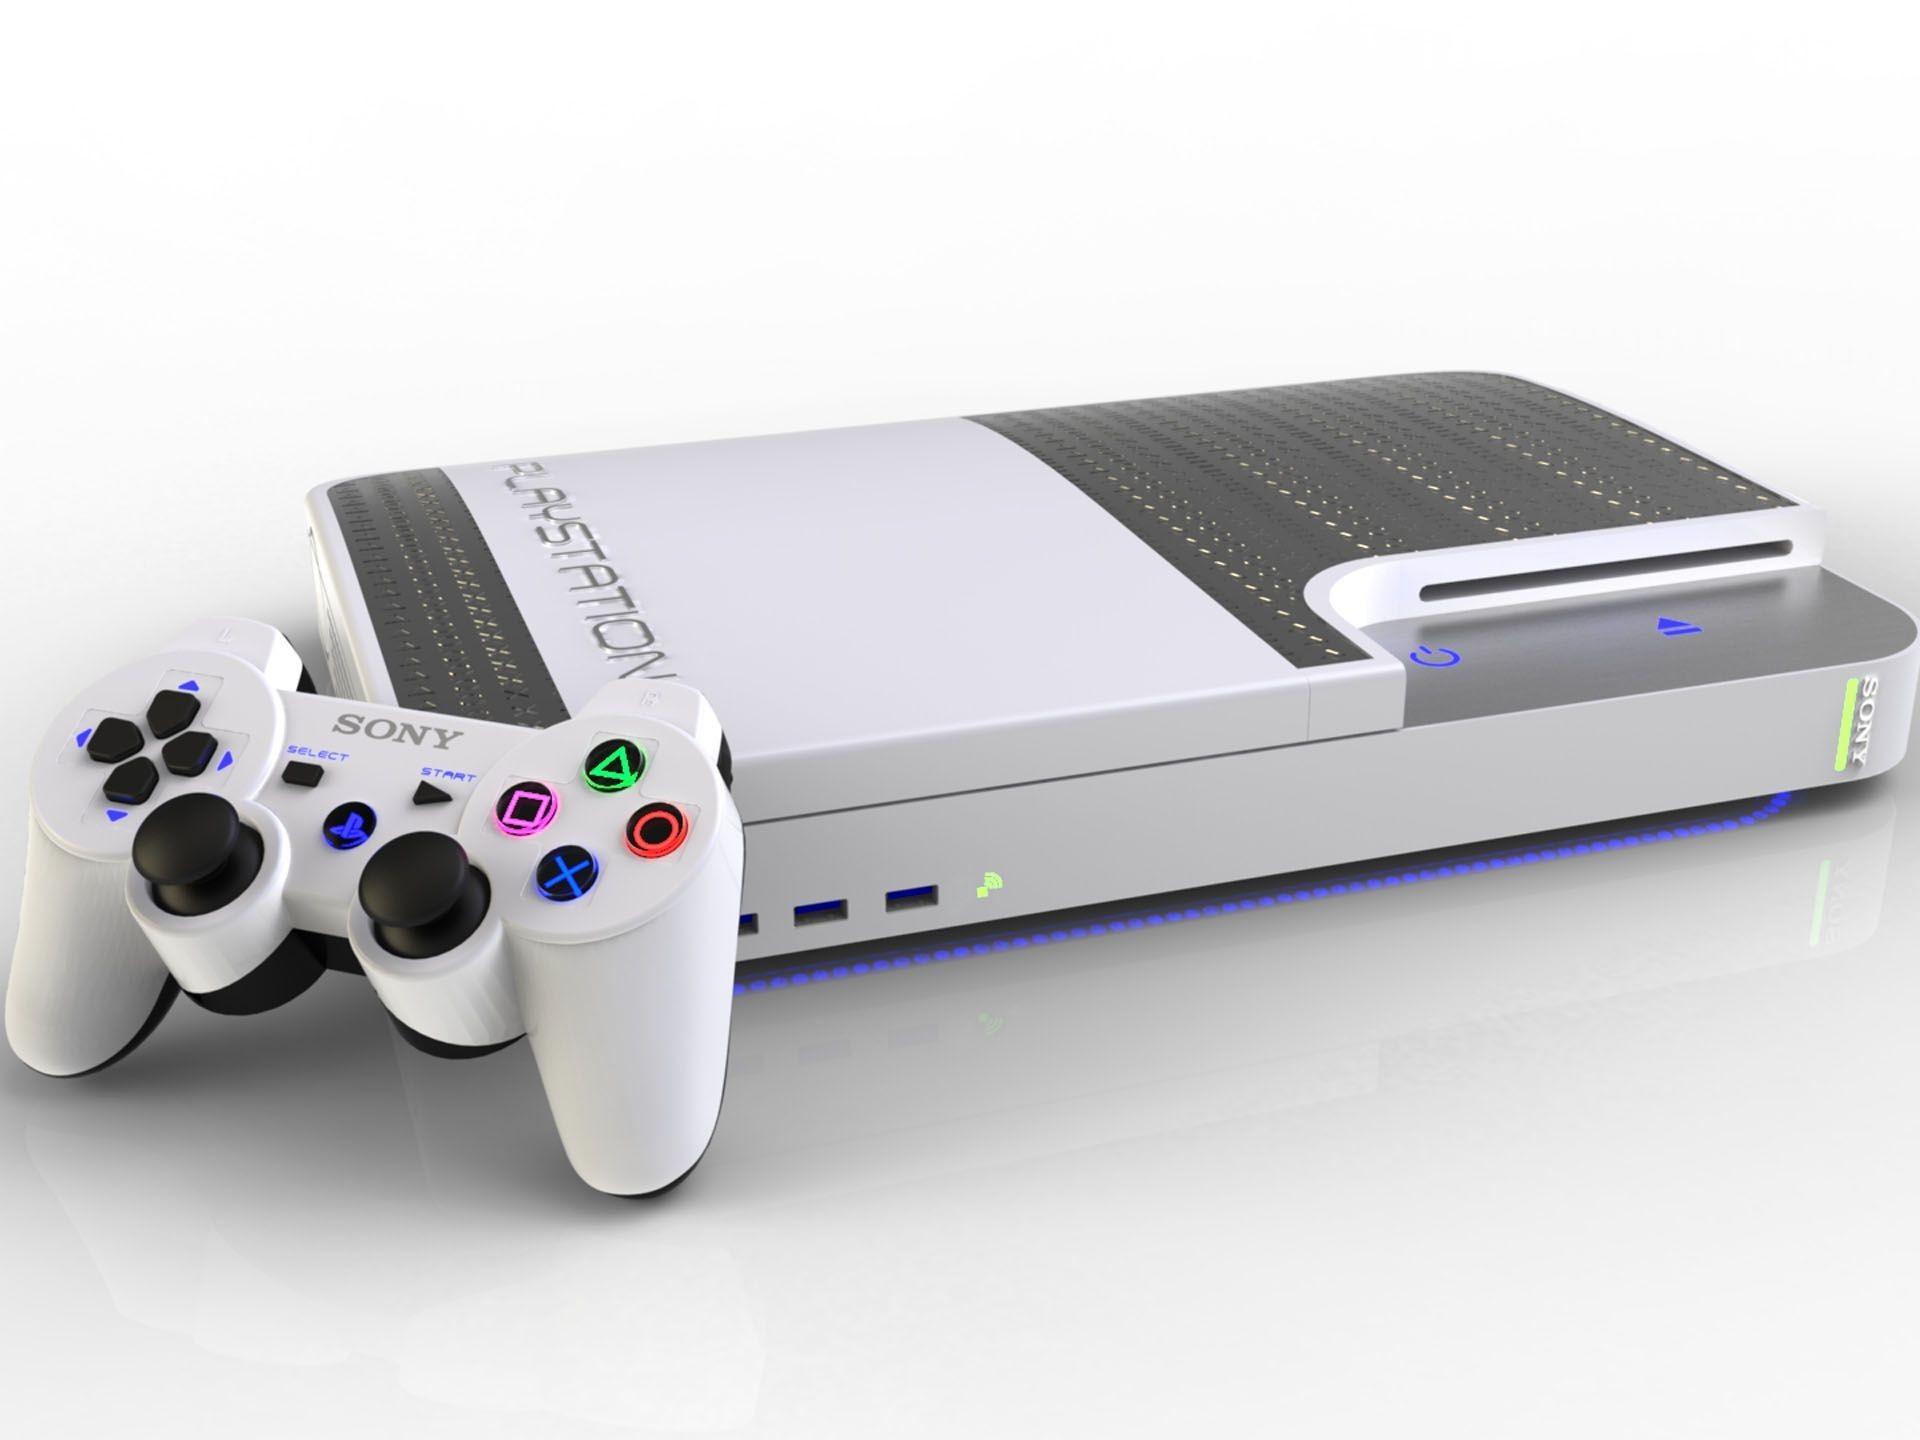 Sony Playstation 4 HD Wallpaper